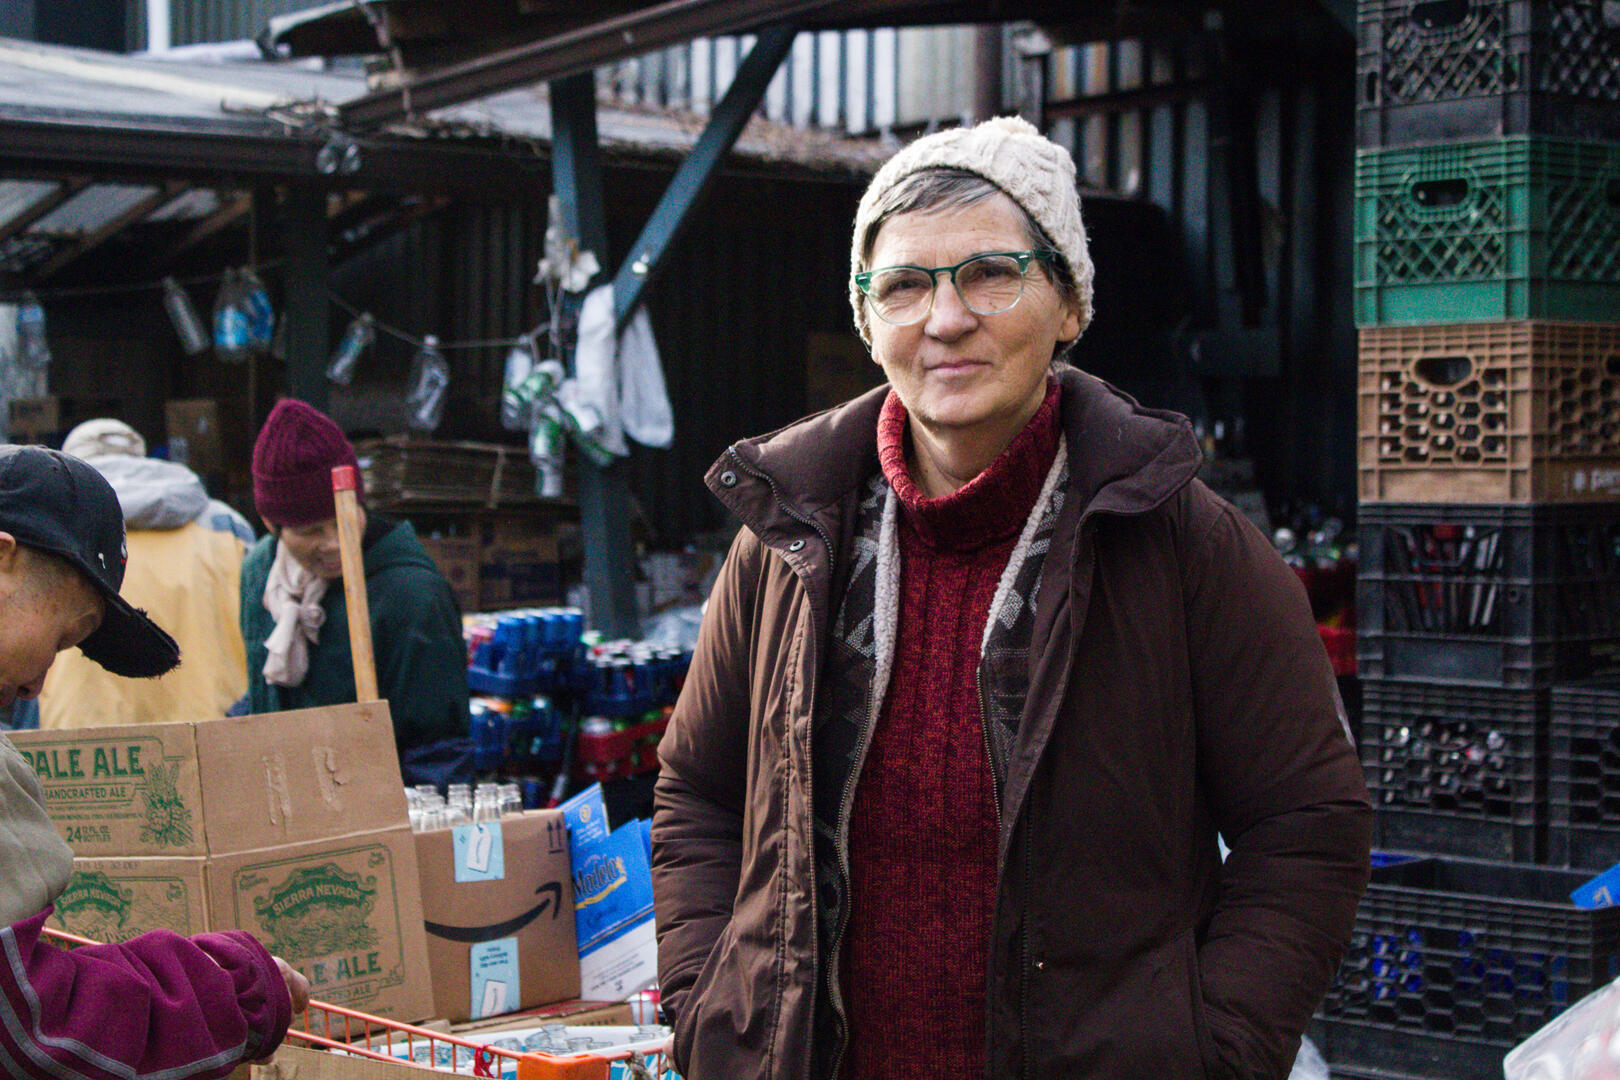 Ana Martinez de Luco, religieuse espagnole, co-fondatrice de Sure We Can, à Brooklyn.